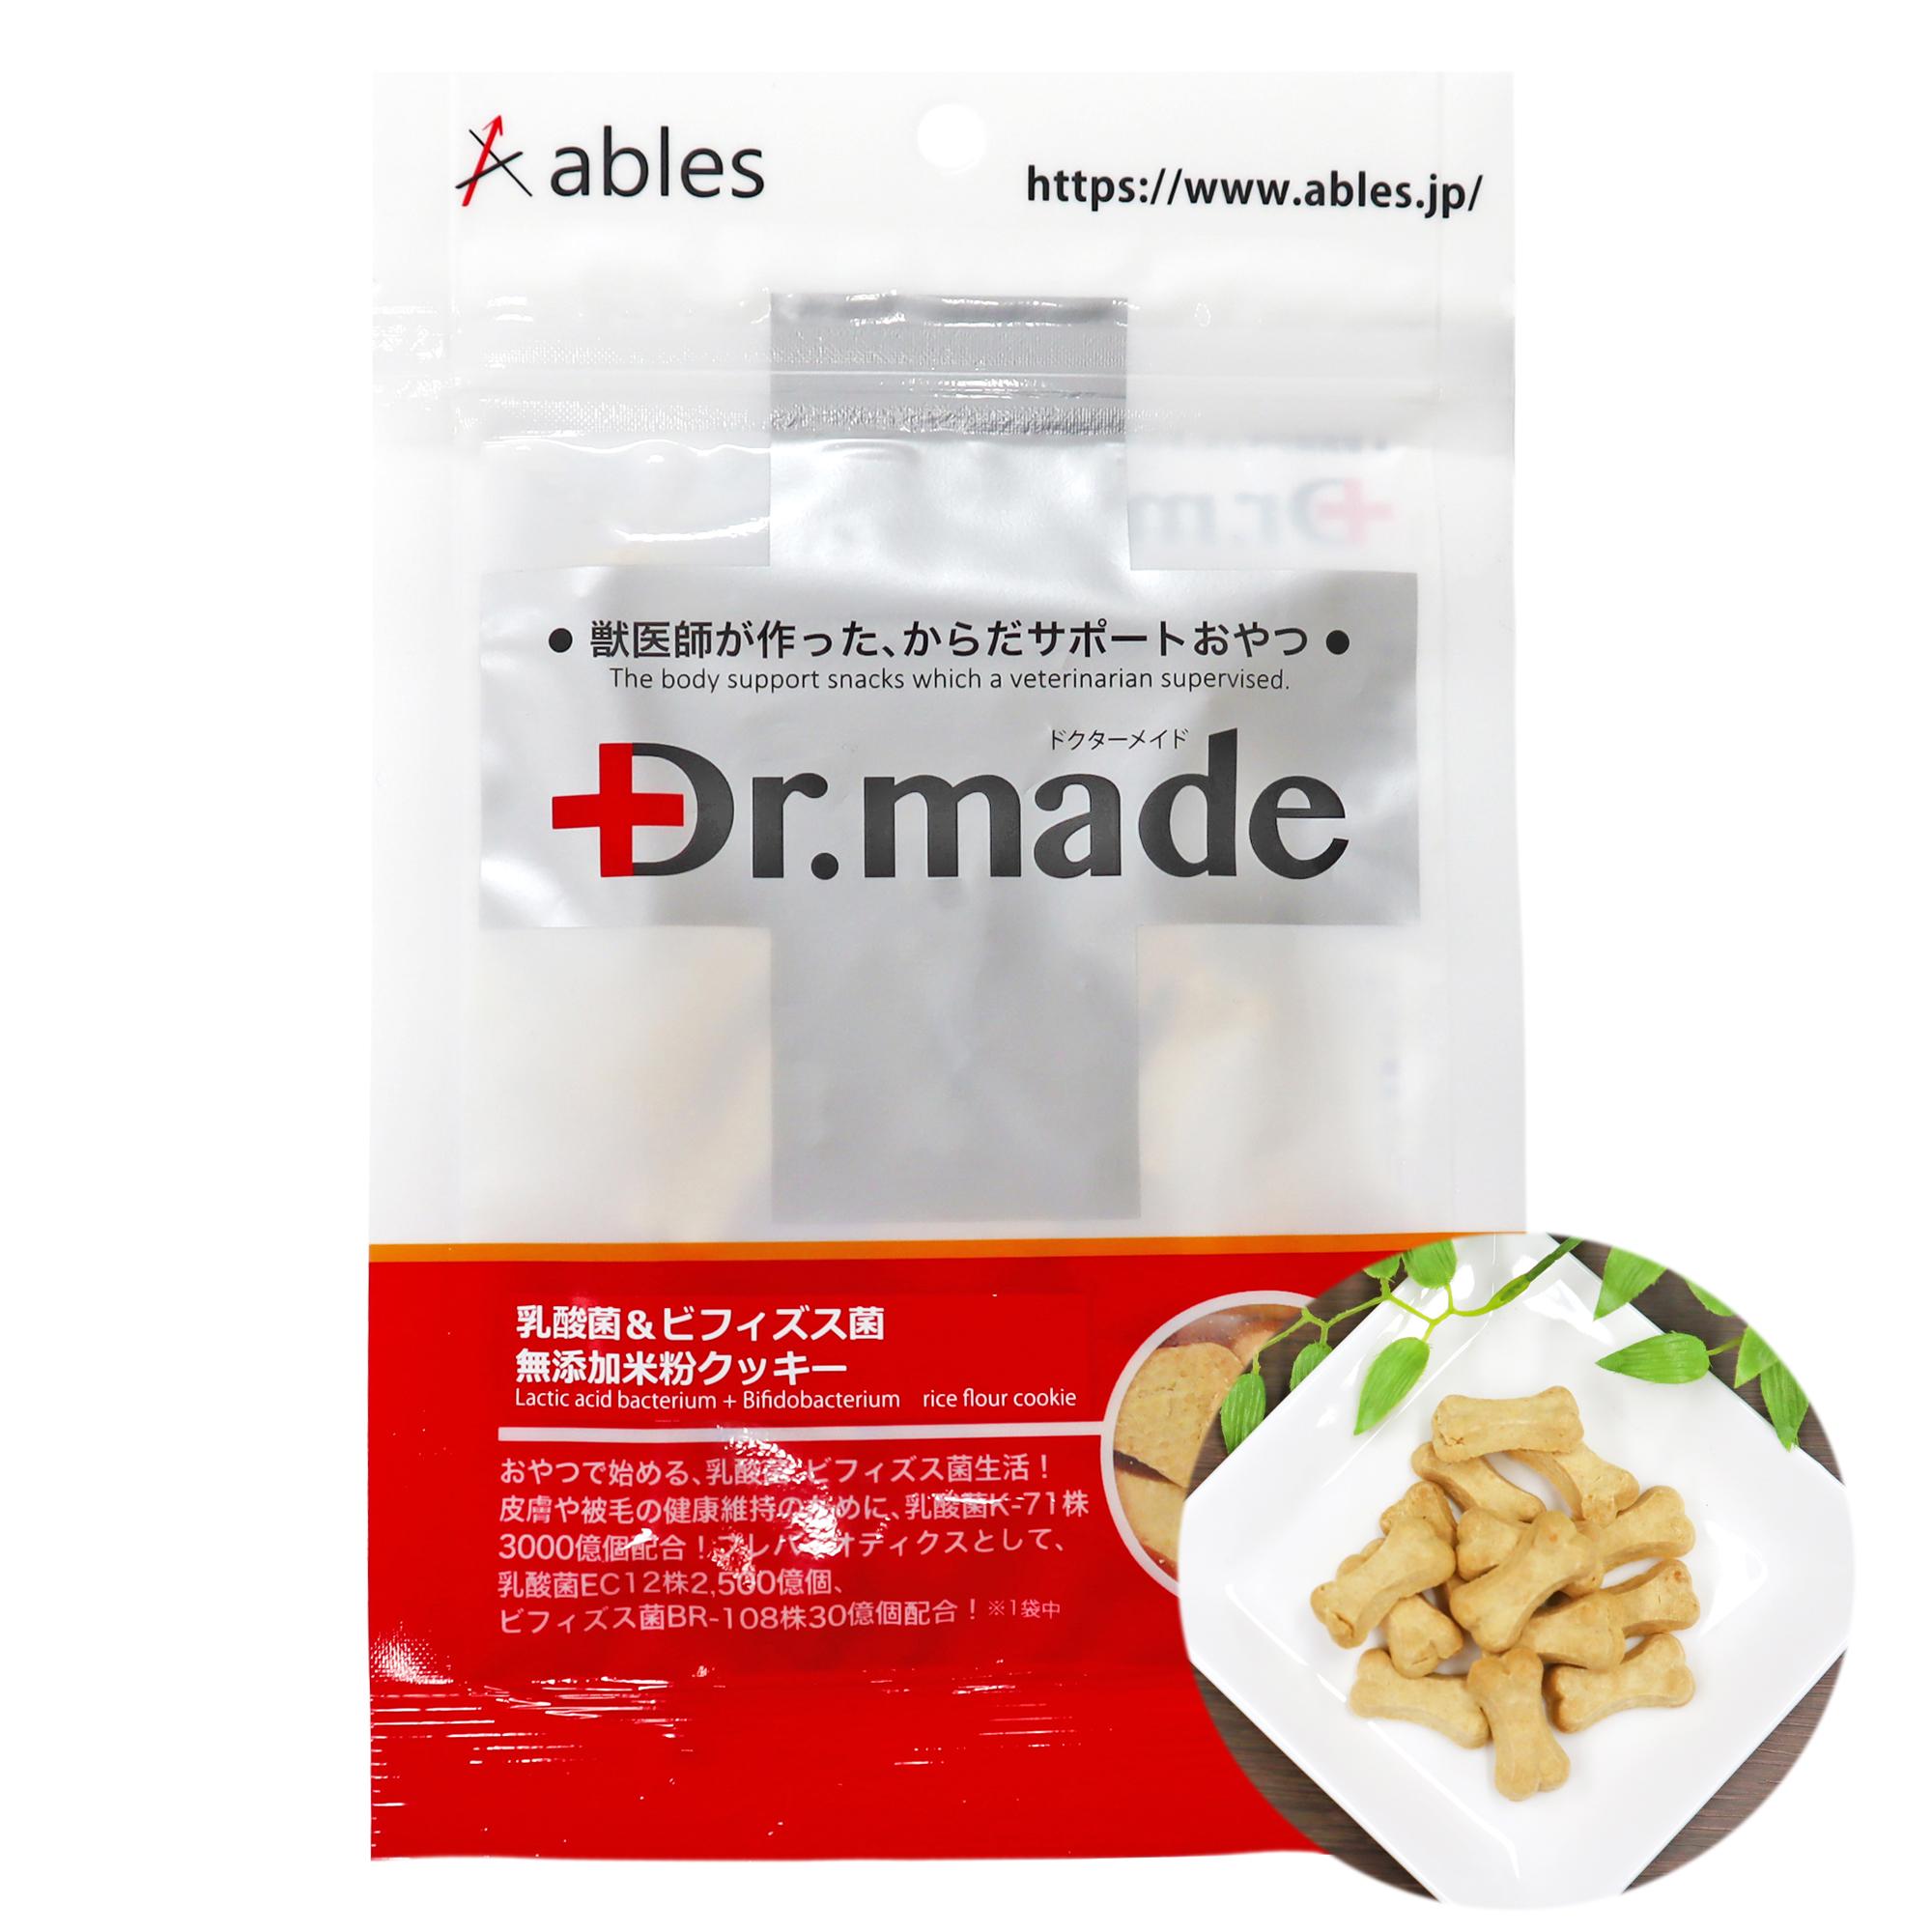 Dr.made 乳酸菌&ビフィズス菌 無添加米粉クッキー 30g